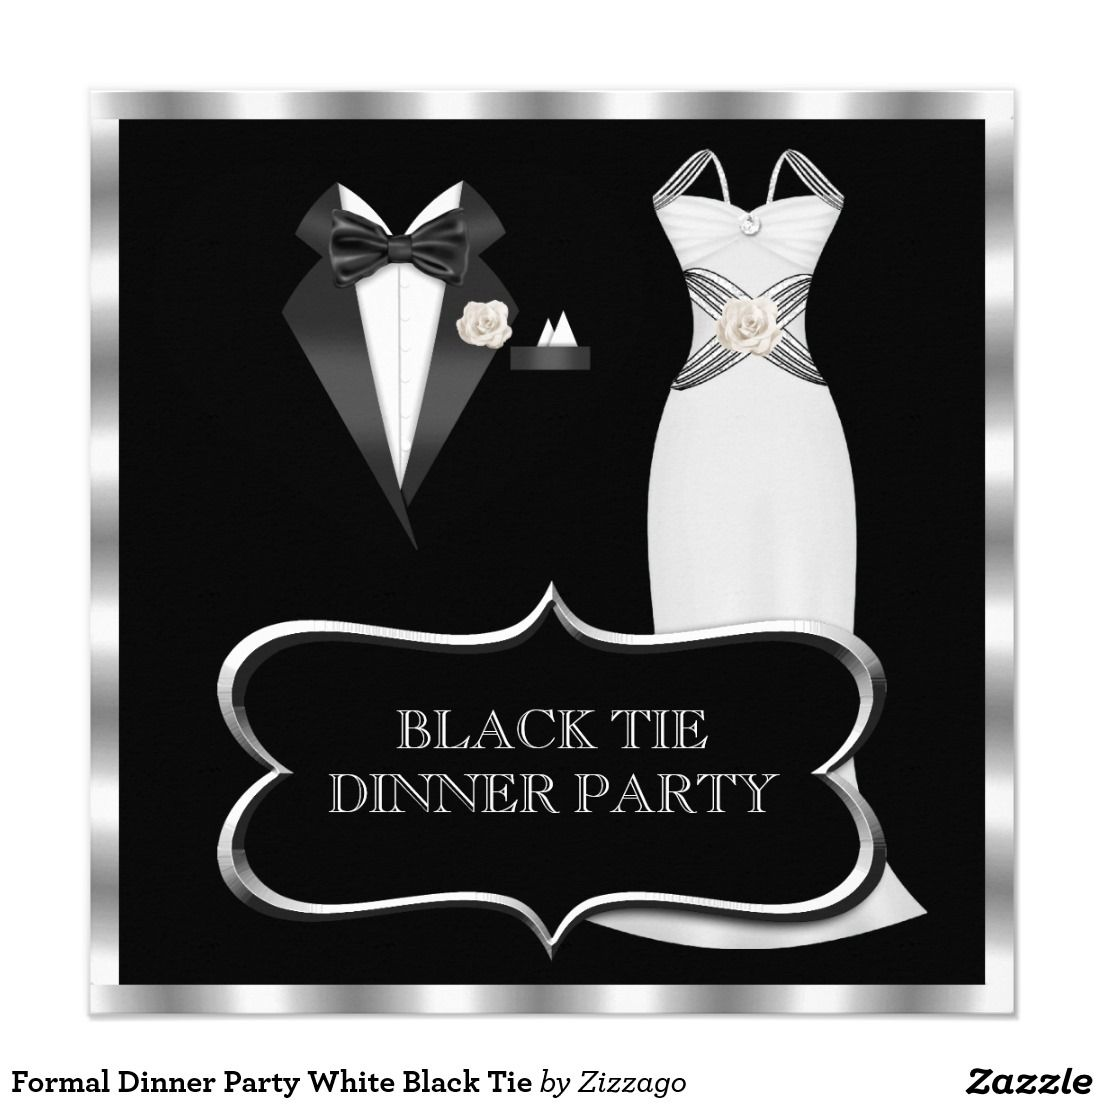 formal dinner party white black tie card zizzago